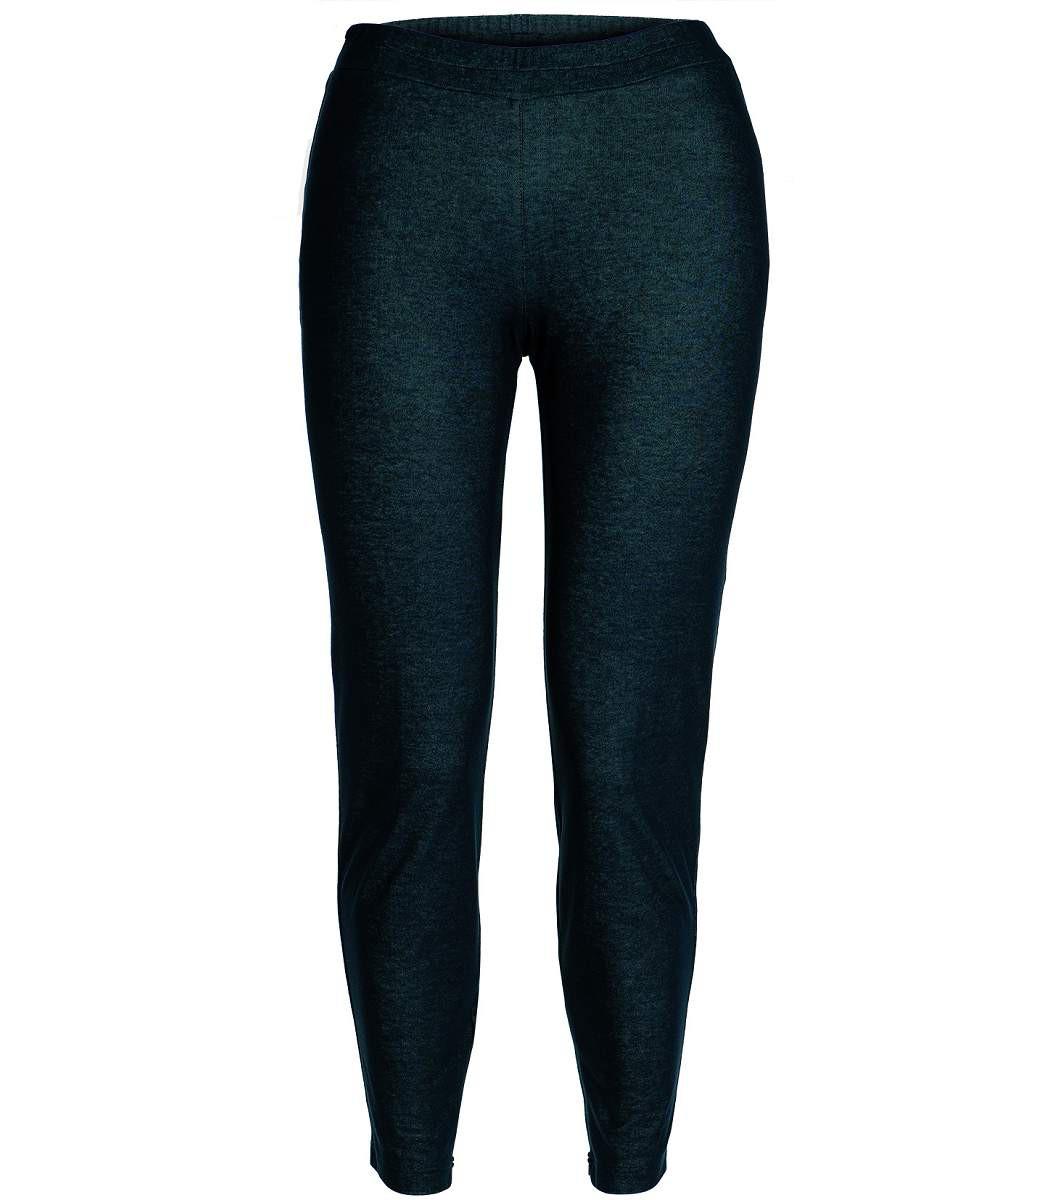 damen xxl jeggings jeans leggings sempre piu by chalou blau. Black Bedroom Furniture Sets. Home Design Ideas